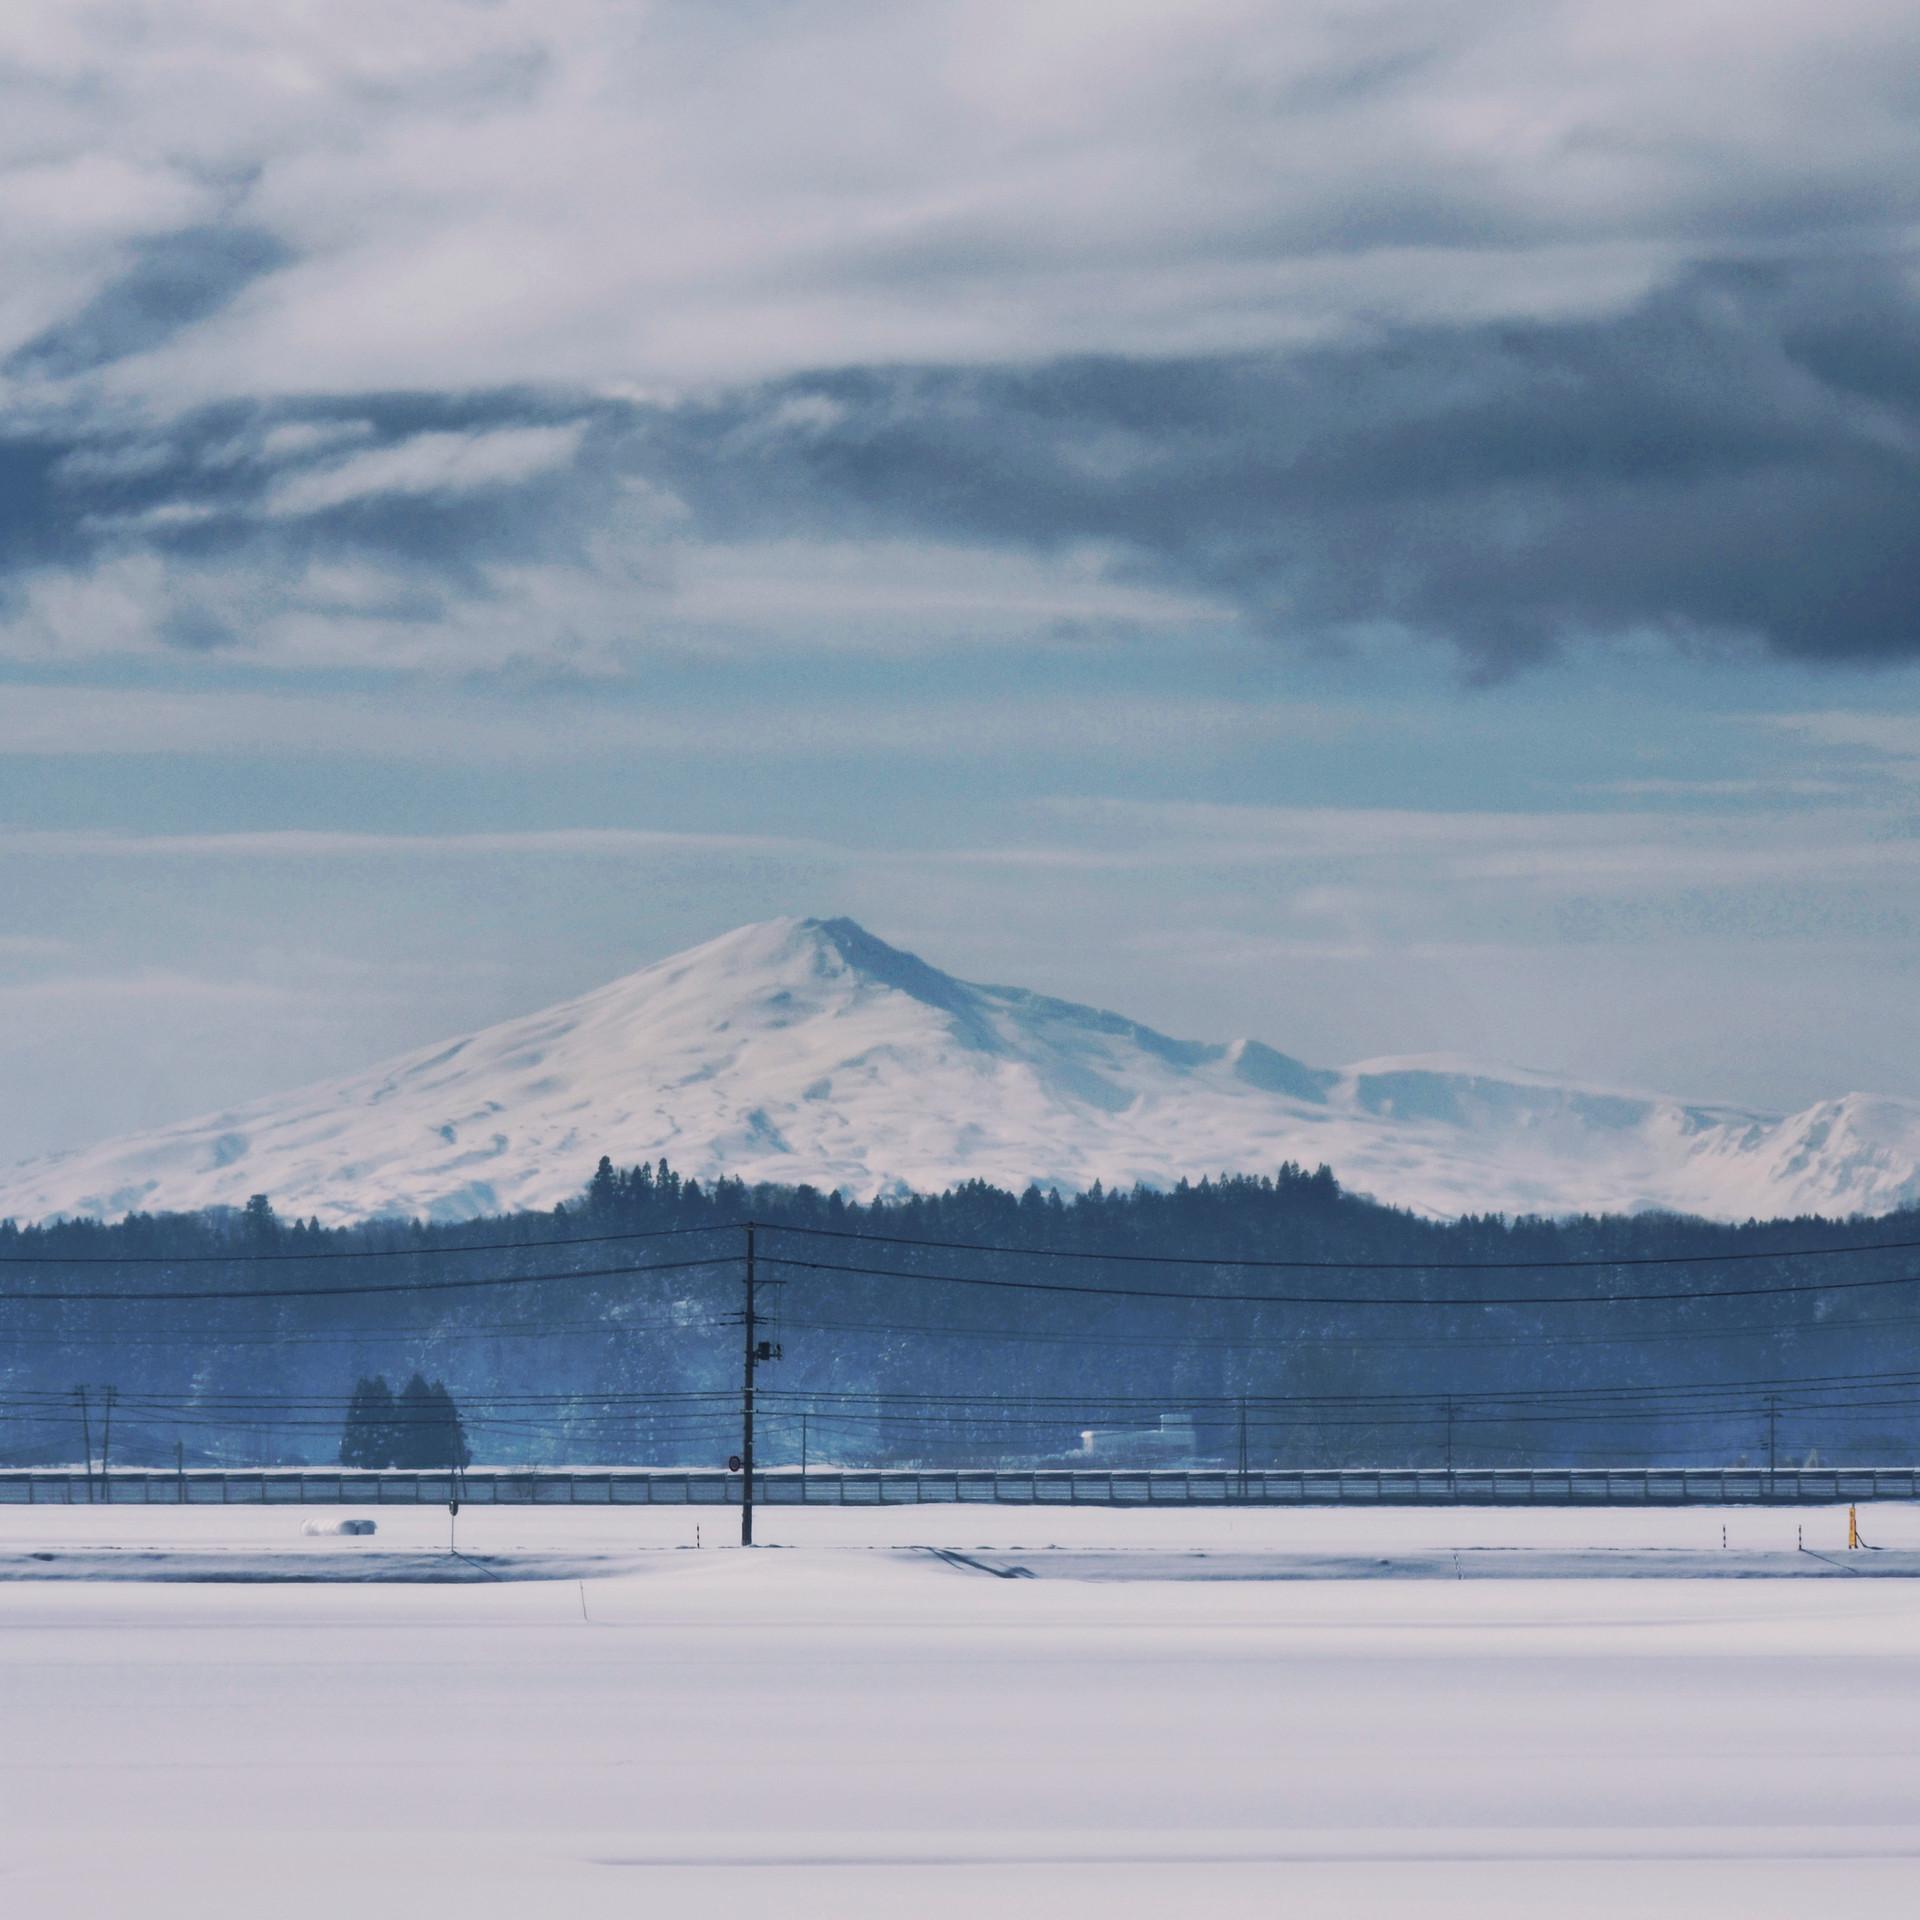 View from the train: Mount Chokai